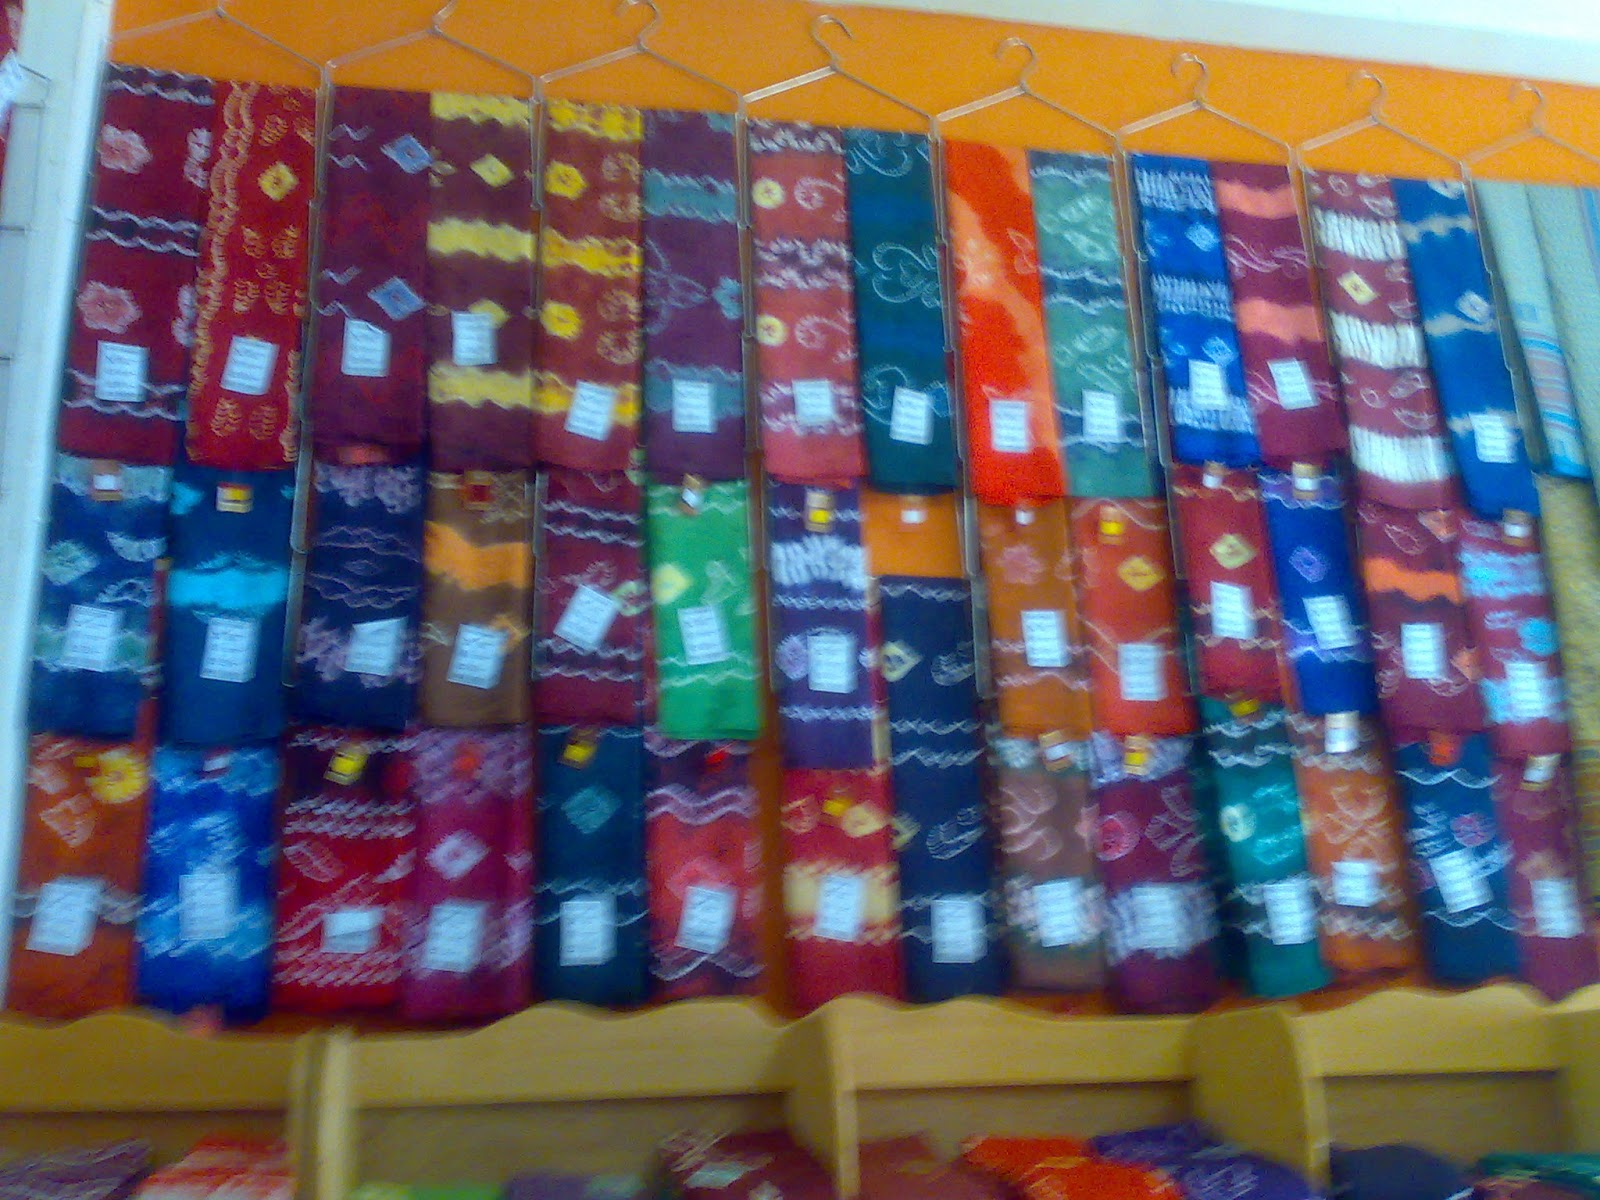 akids os Jual kain batik sasirangan khas kalimantan selatan